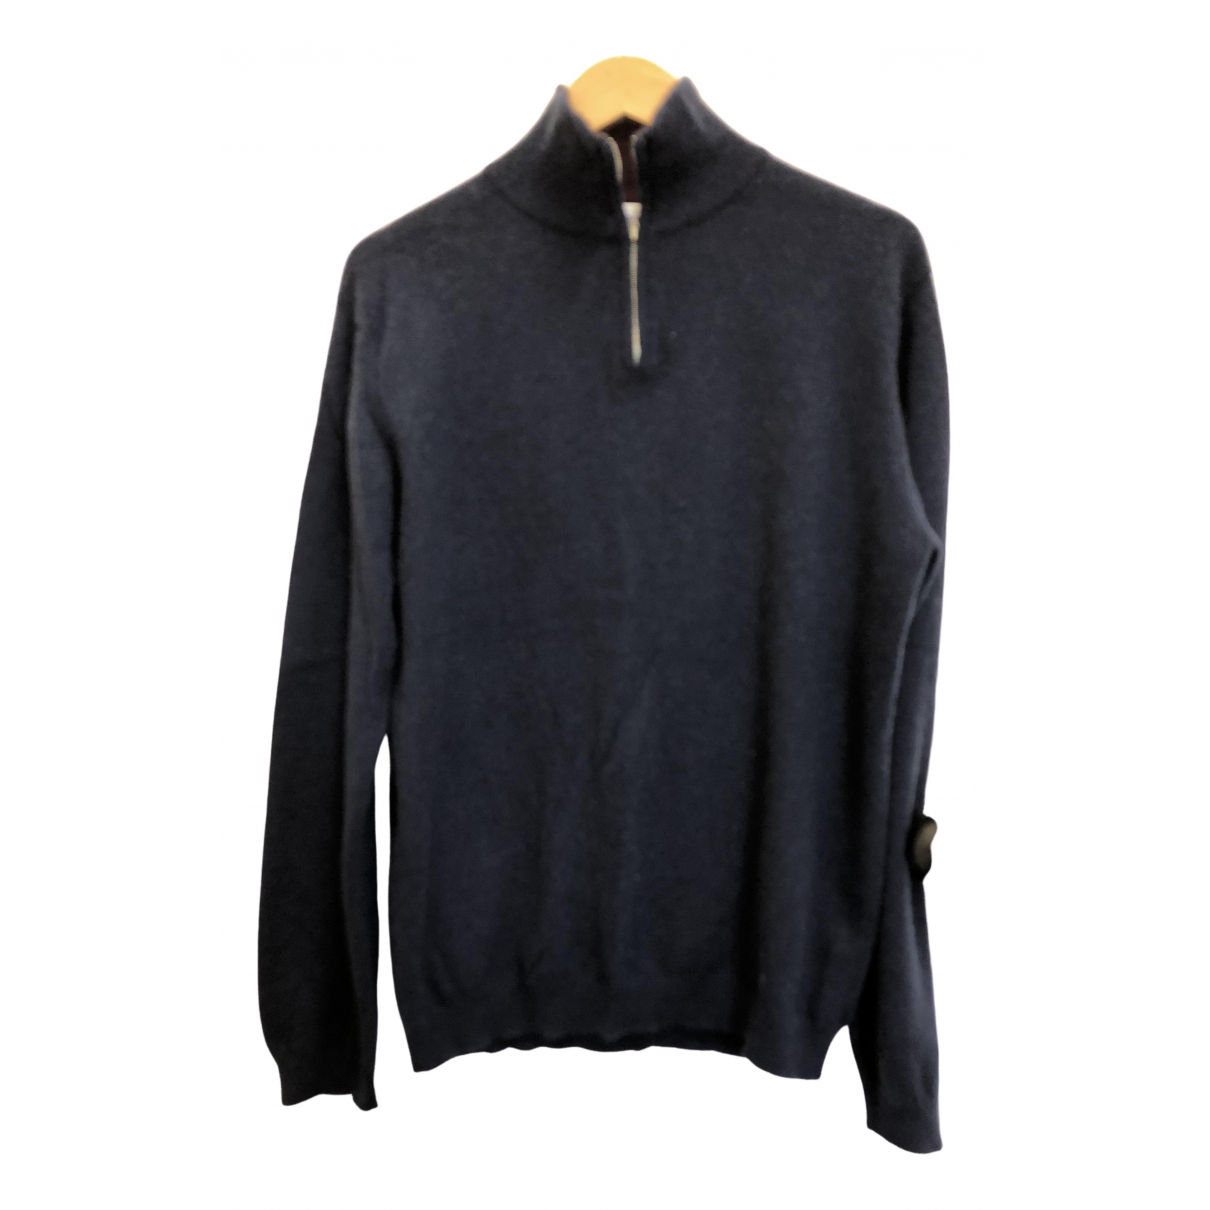 Brora \N Blue Cashmere Knitwear & Sweatshirts for Men M International